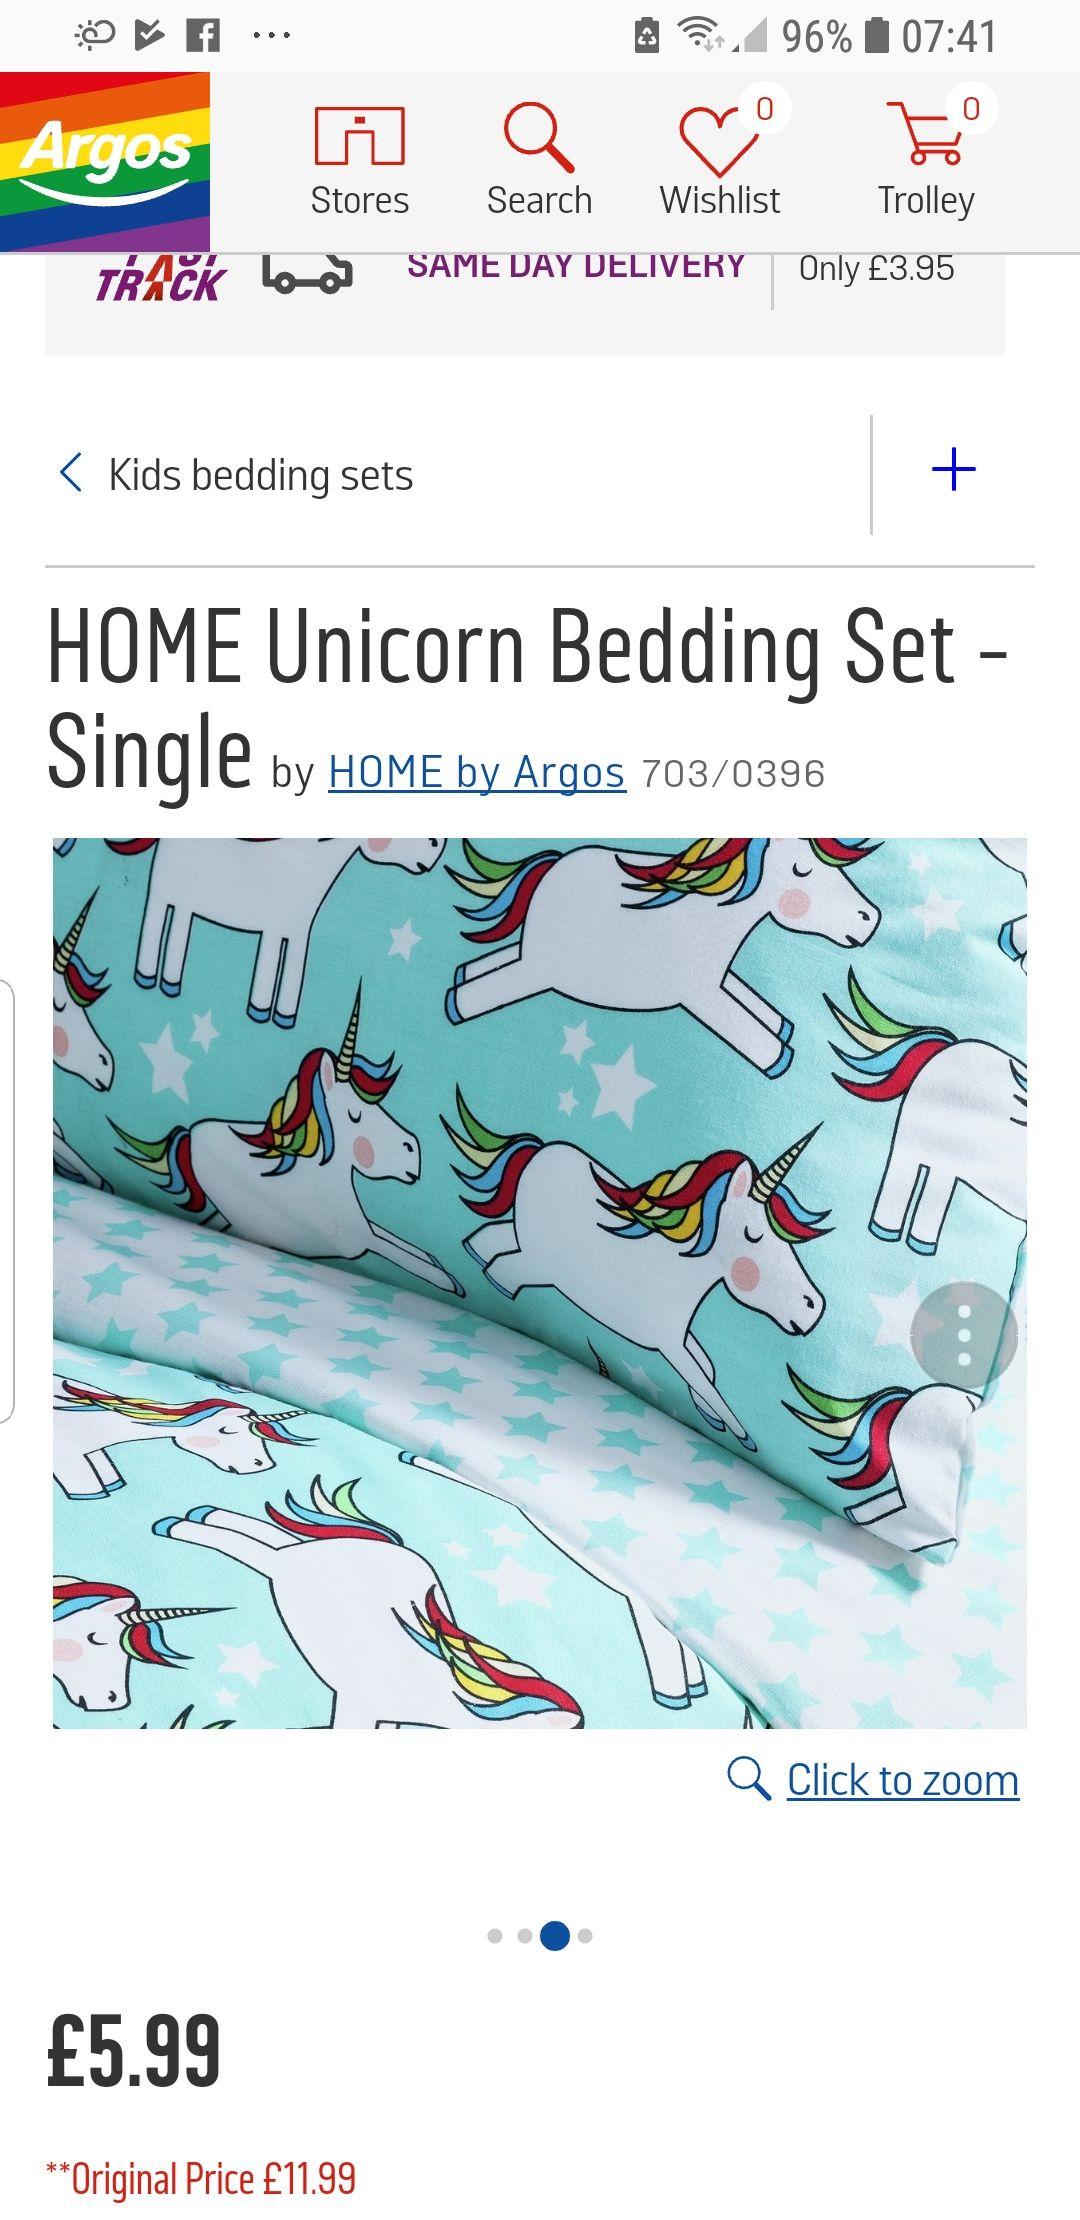 Unicorn bedding Toddler bed £3.99 & 4.99 single @ Argos